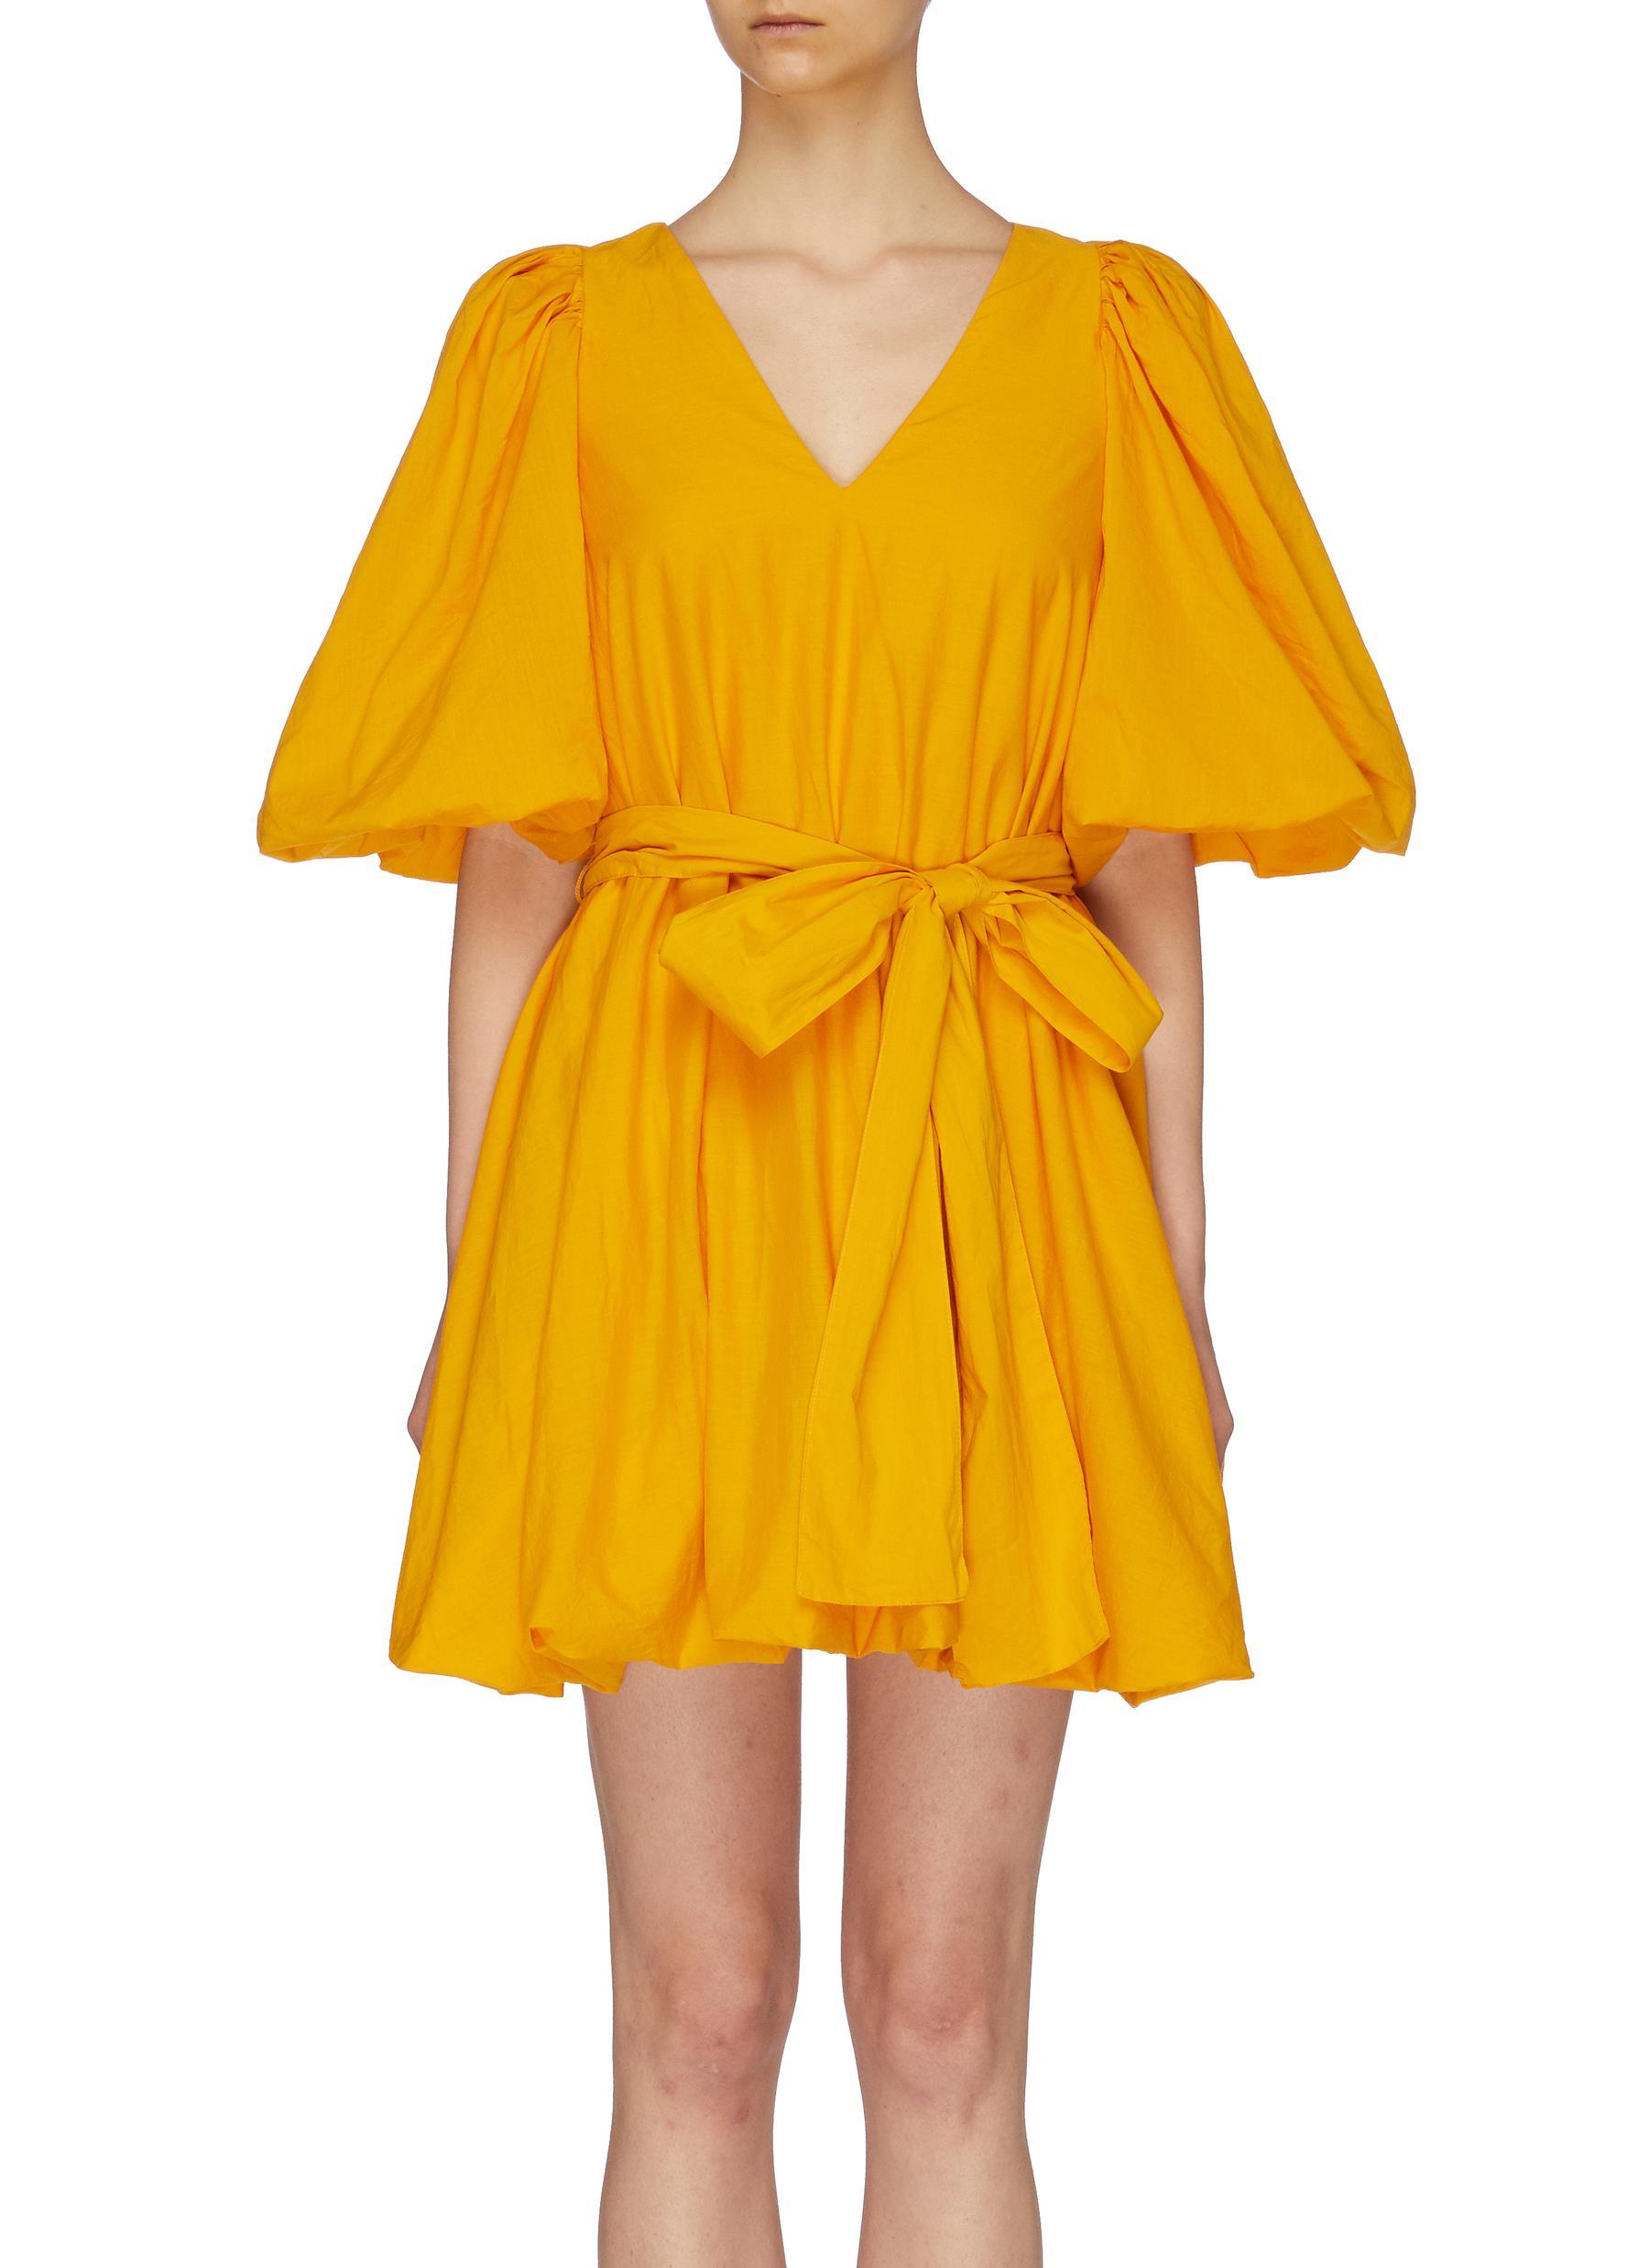 Marni belted puff sleeve bubble hem dress by Rhode Resort